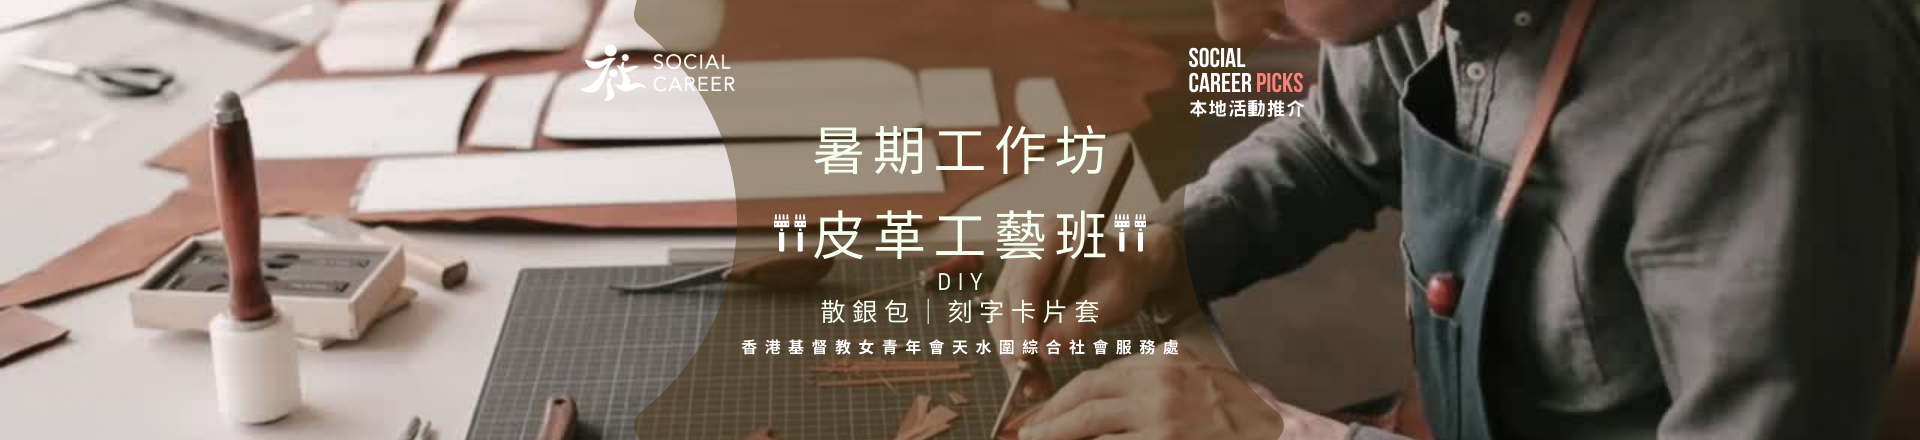 DIY 暑期工作坊 皮革工藝班